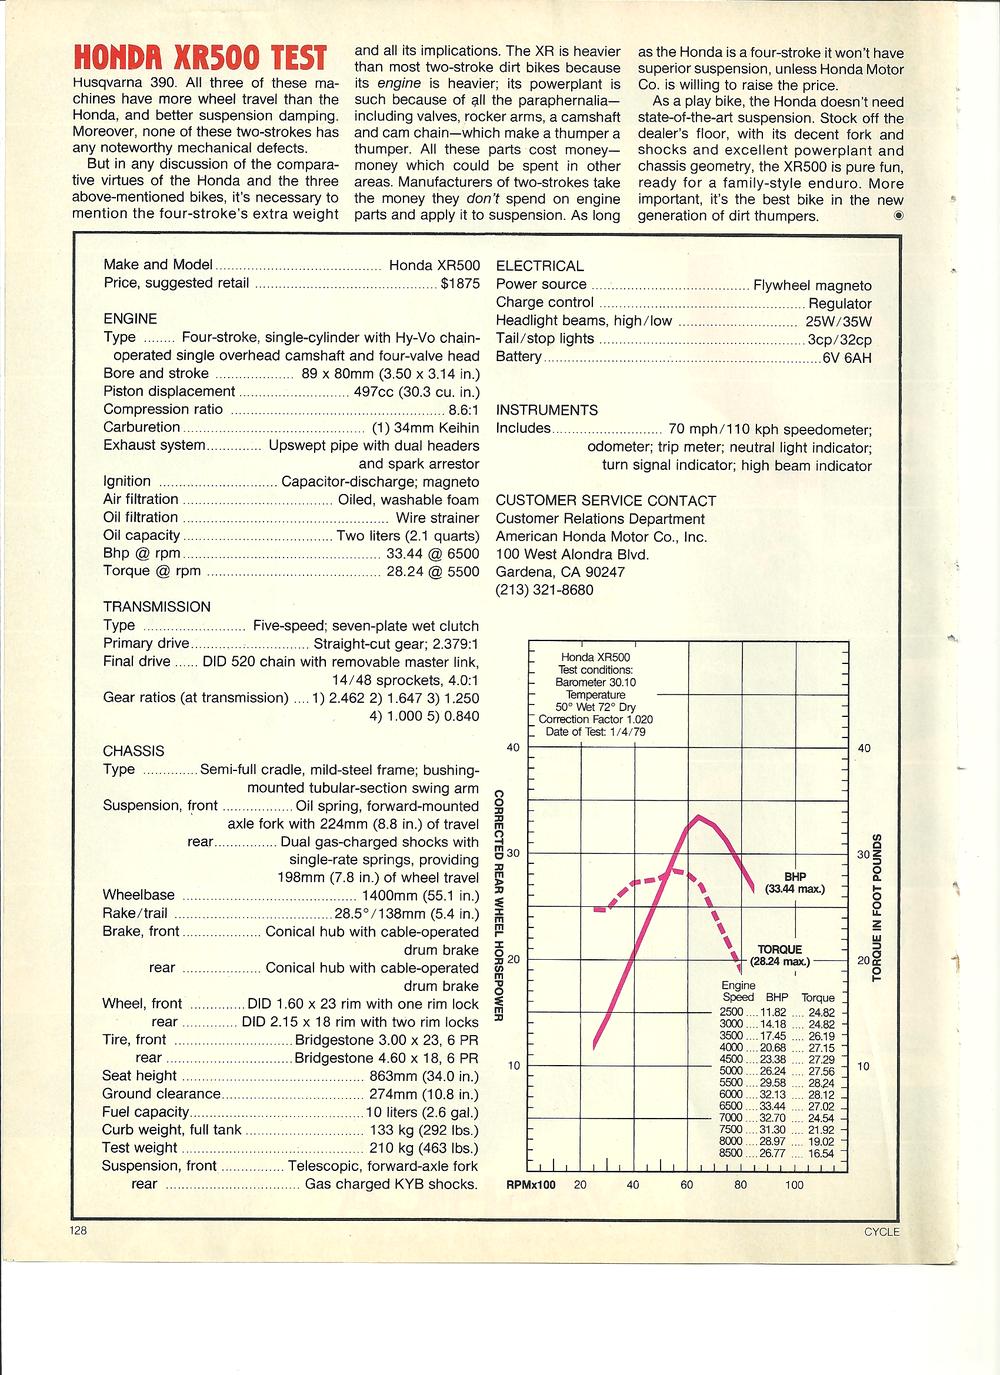 1979_Honda_XR500_test_pg9.png